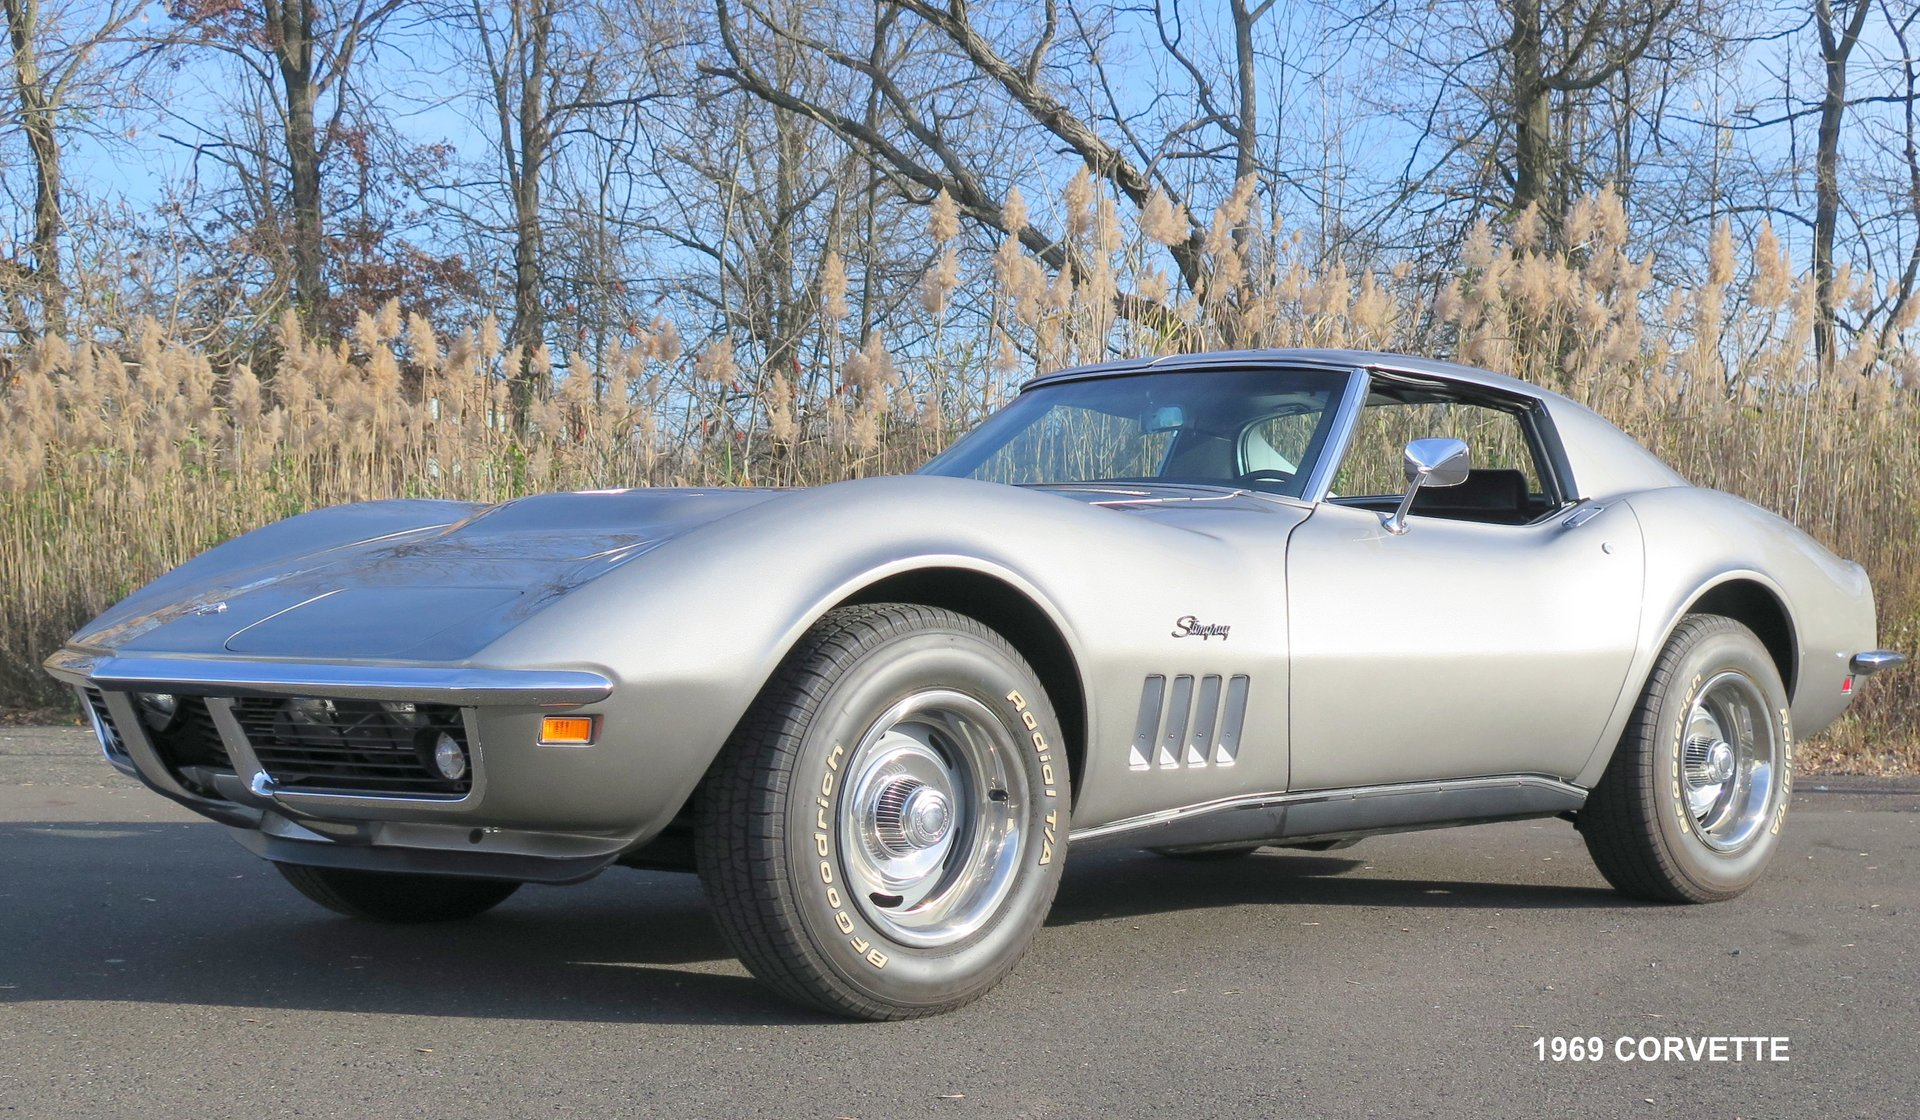 1969 chevrolet corvette stingray 383 m21 4 speed manual trans